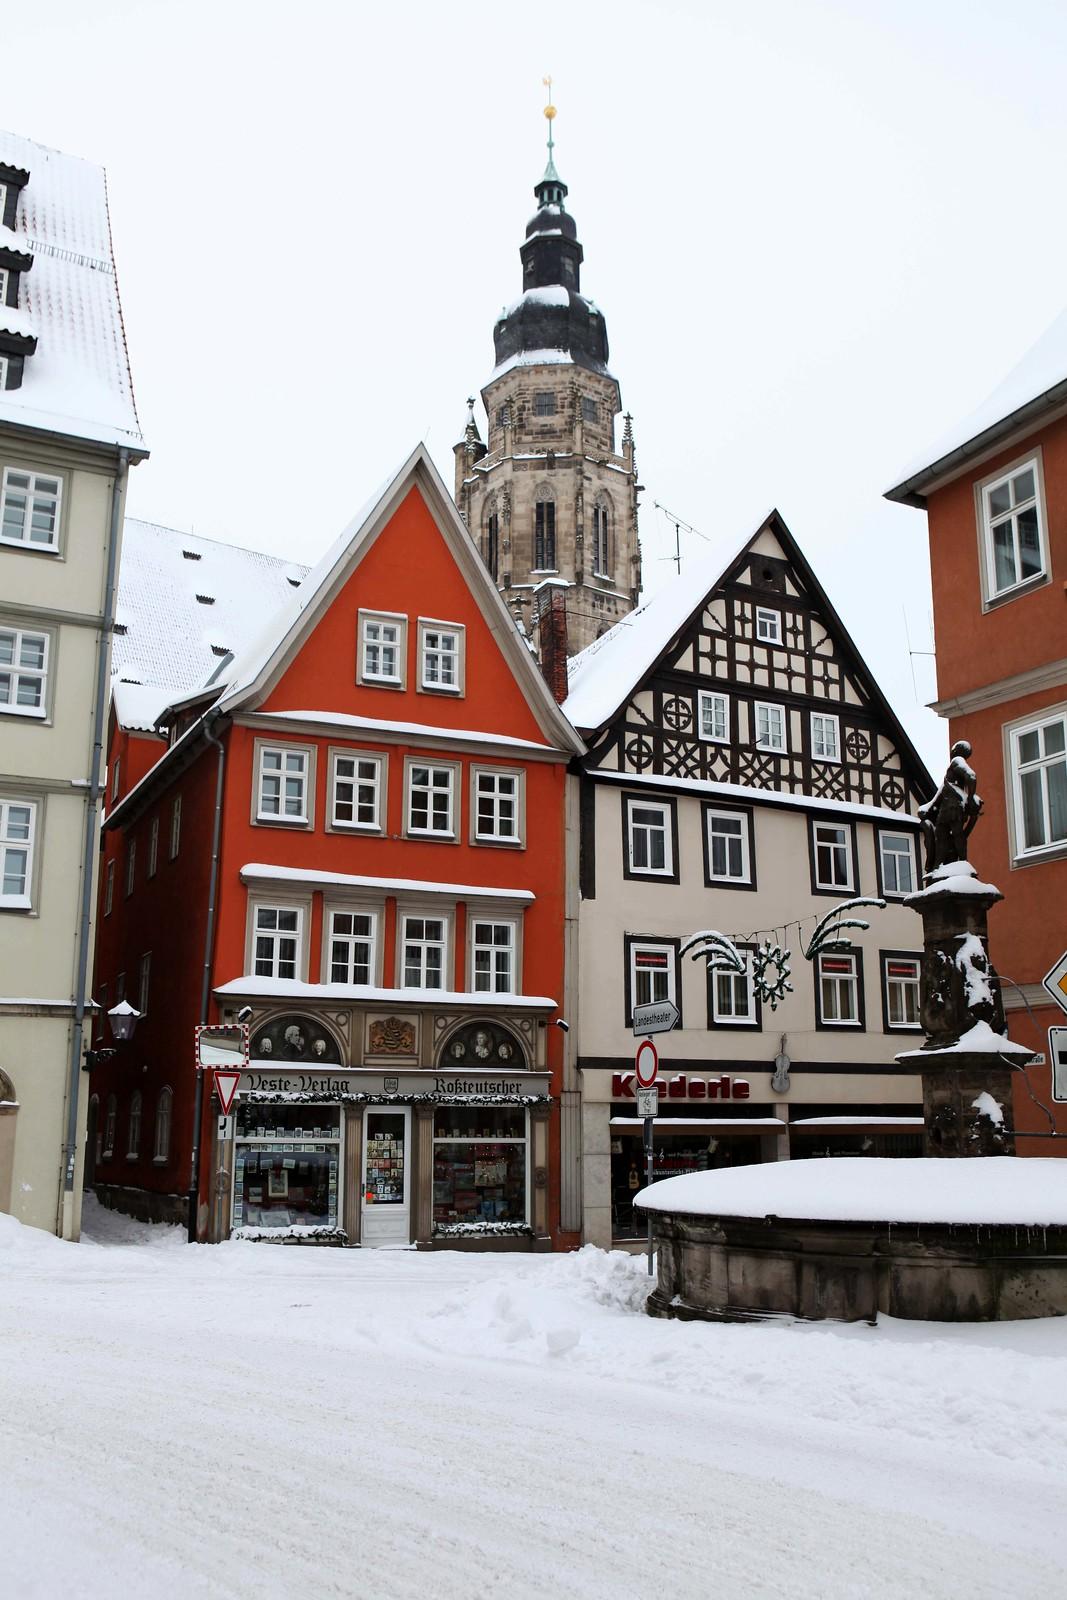 Störfix, Morizkirche Coburg, davor Steingasse 16, 25. Dezember 2010